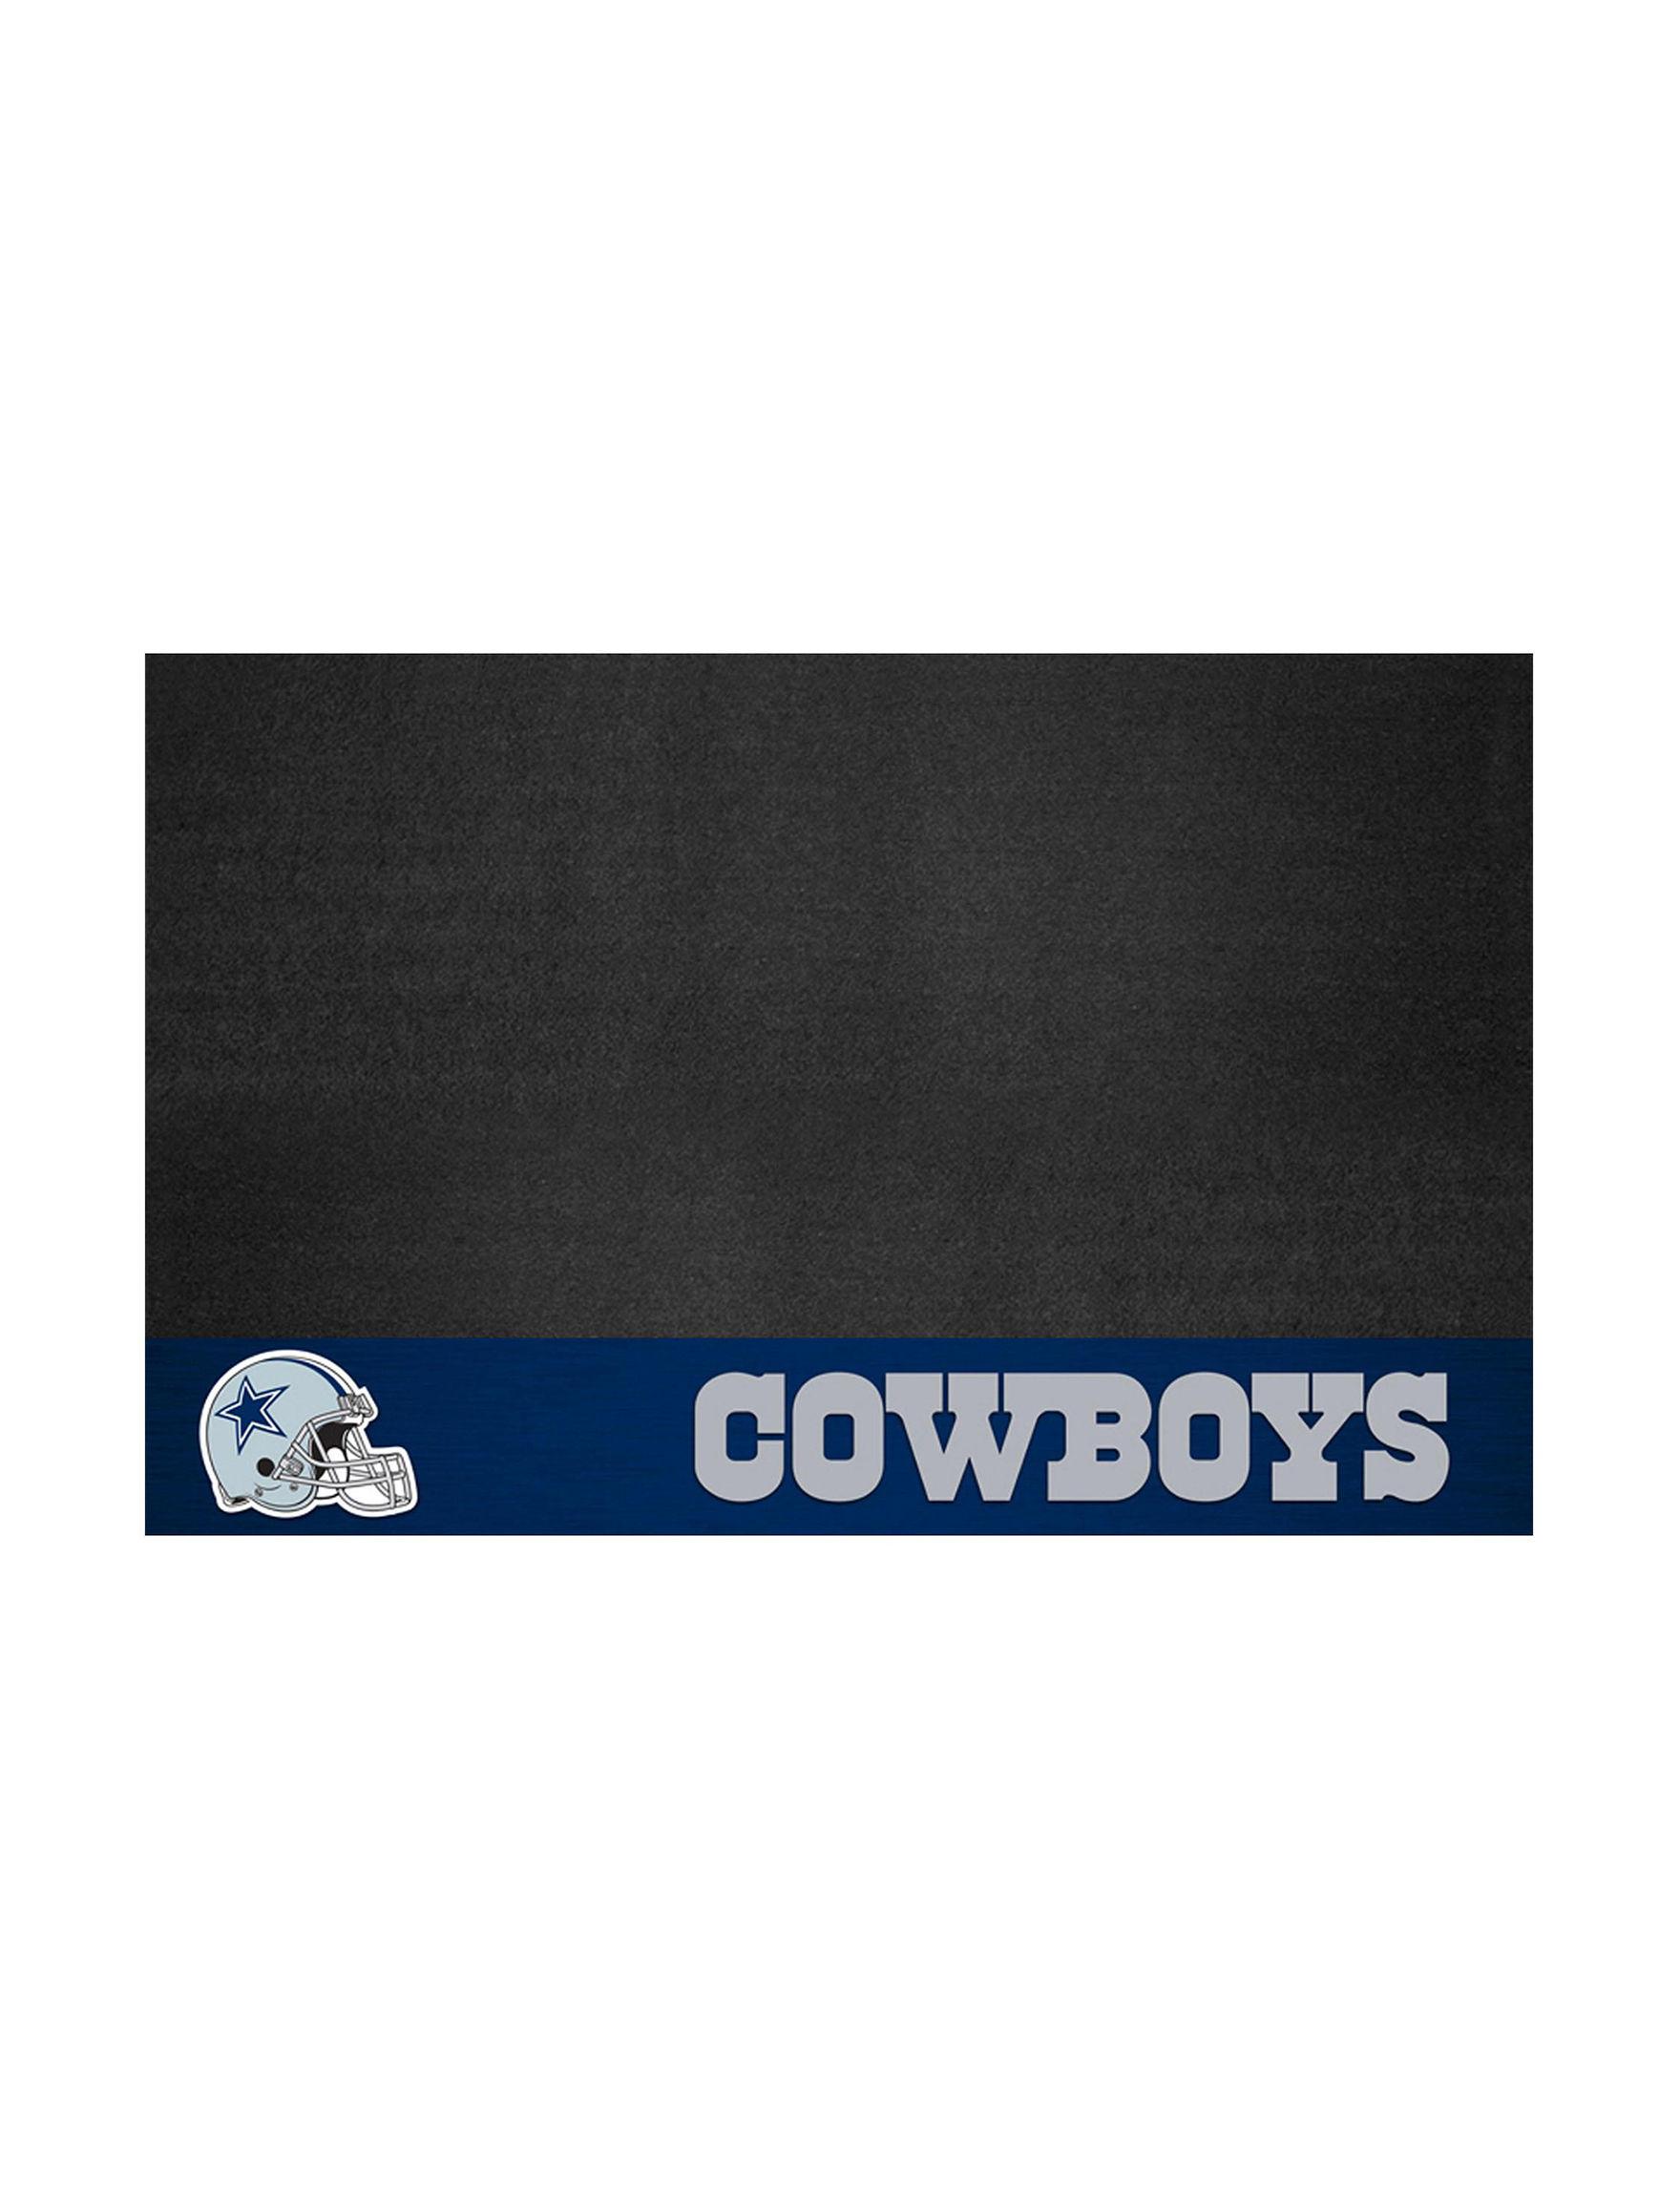 Fanmats Blue Outdoor Rugs & Doormats Outdoor Decor